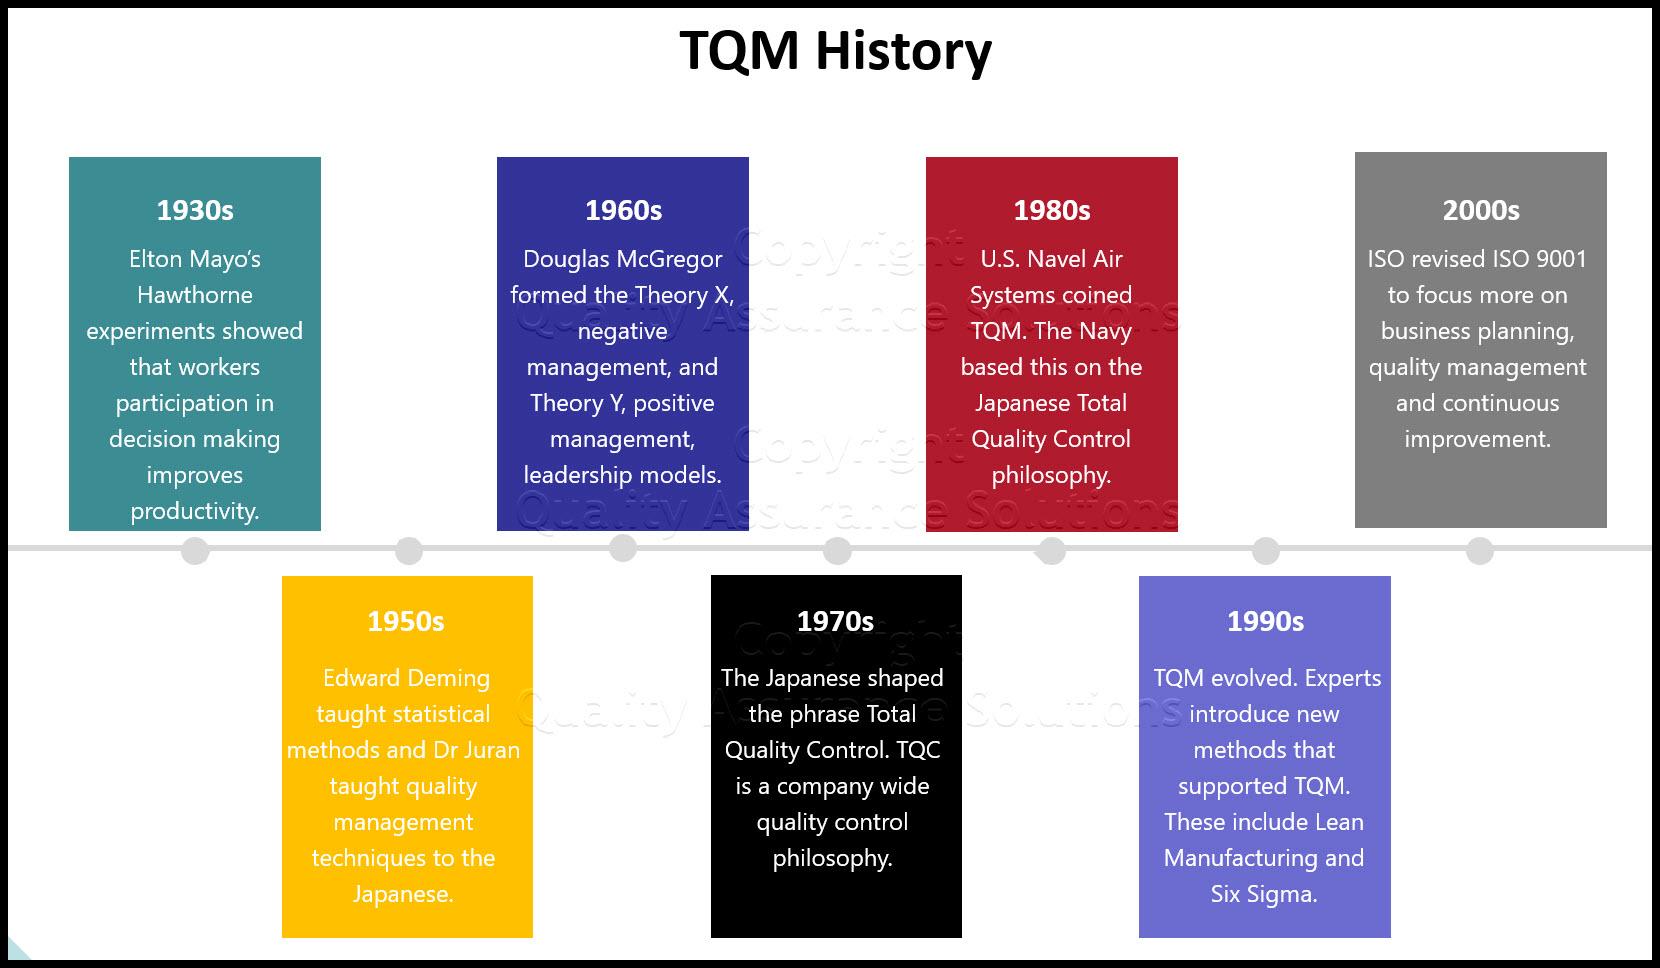 TQM History ppt